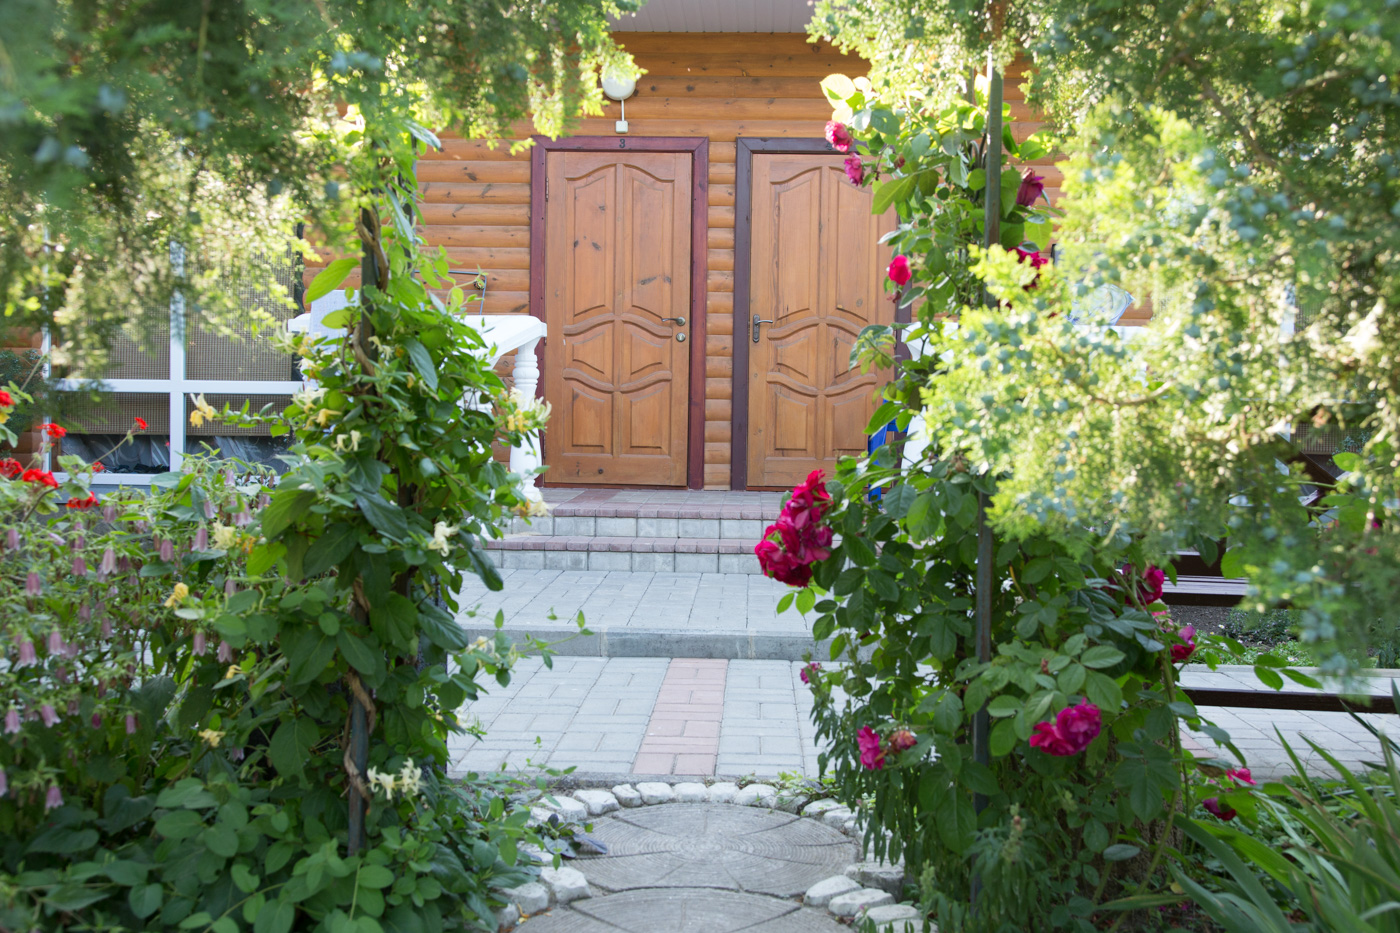 База отдыха «Альтернатива», Береговое, Крым